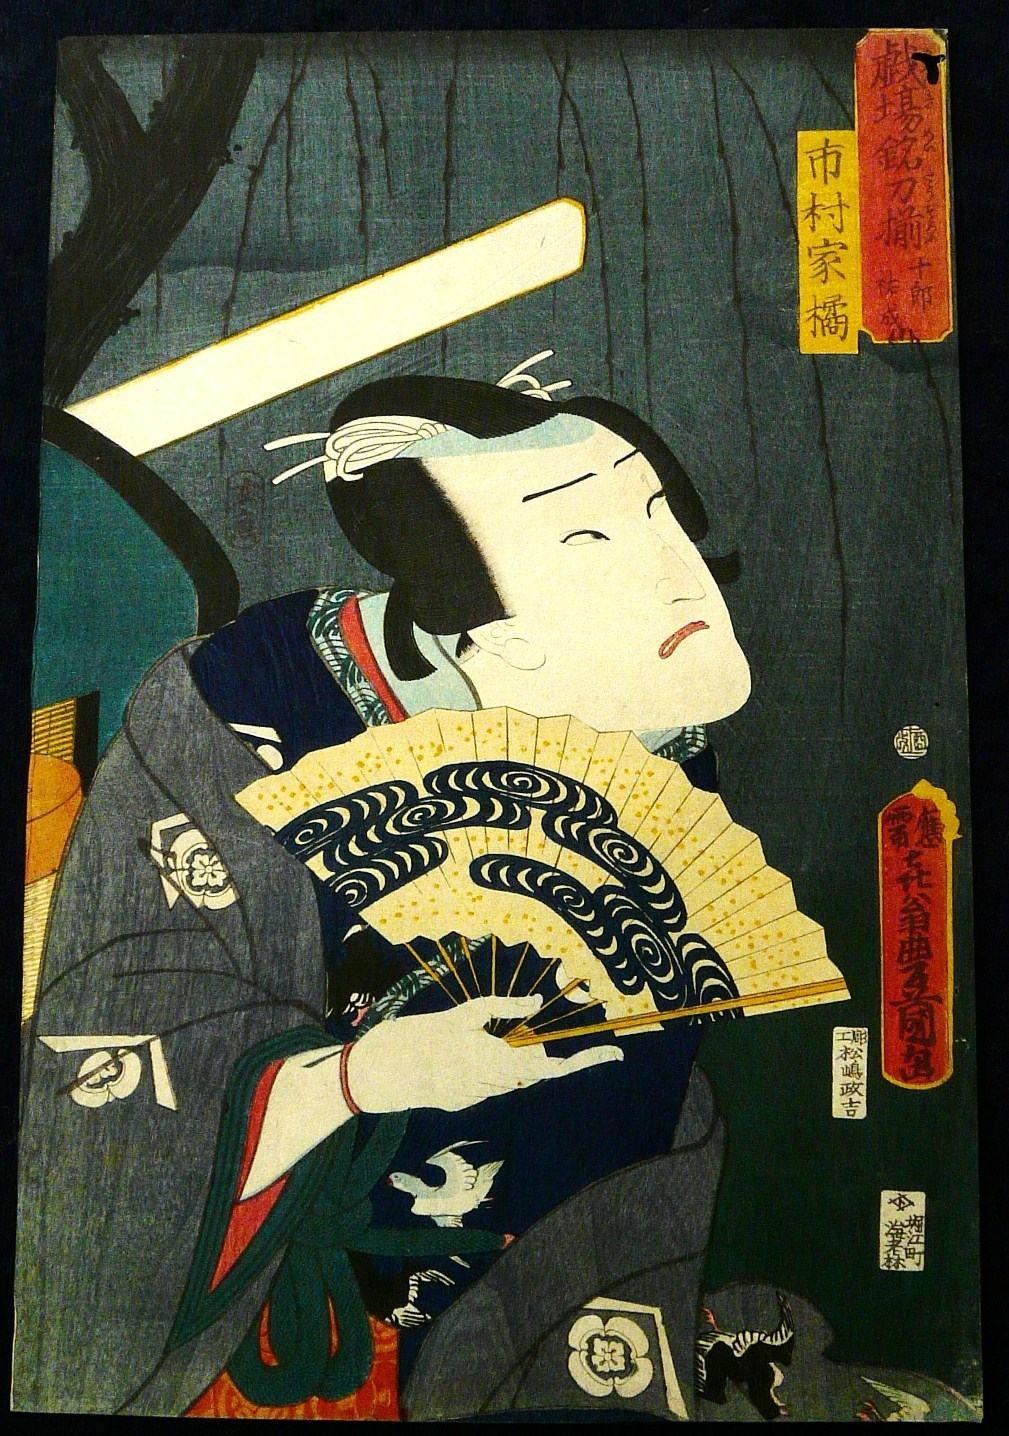 UTAGAWA KUNISADA: #P3985 ACTOR ICHIMURA KAKITSU FROM THE KABUKI MEITO ZORIO DATED 1863